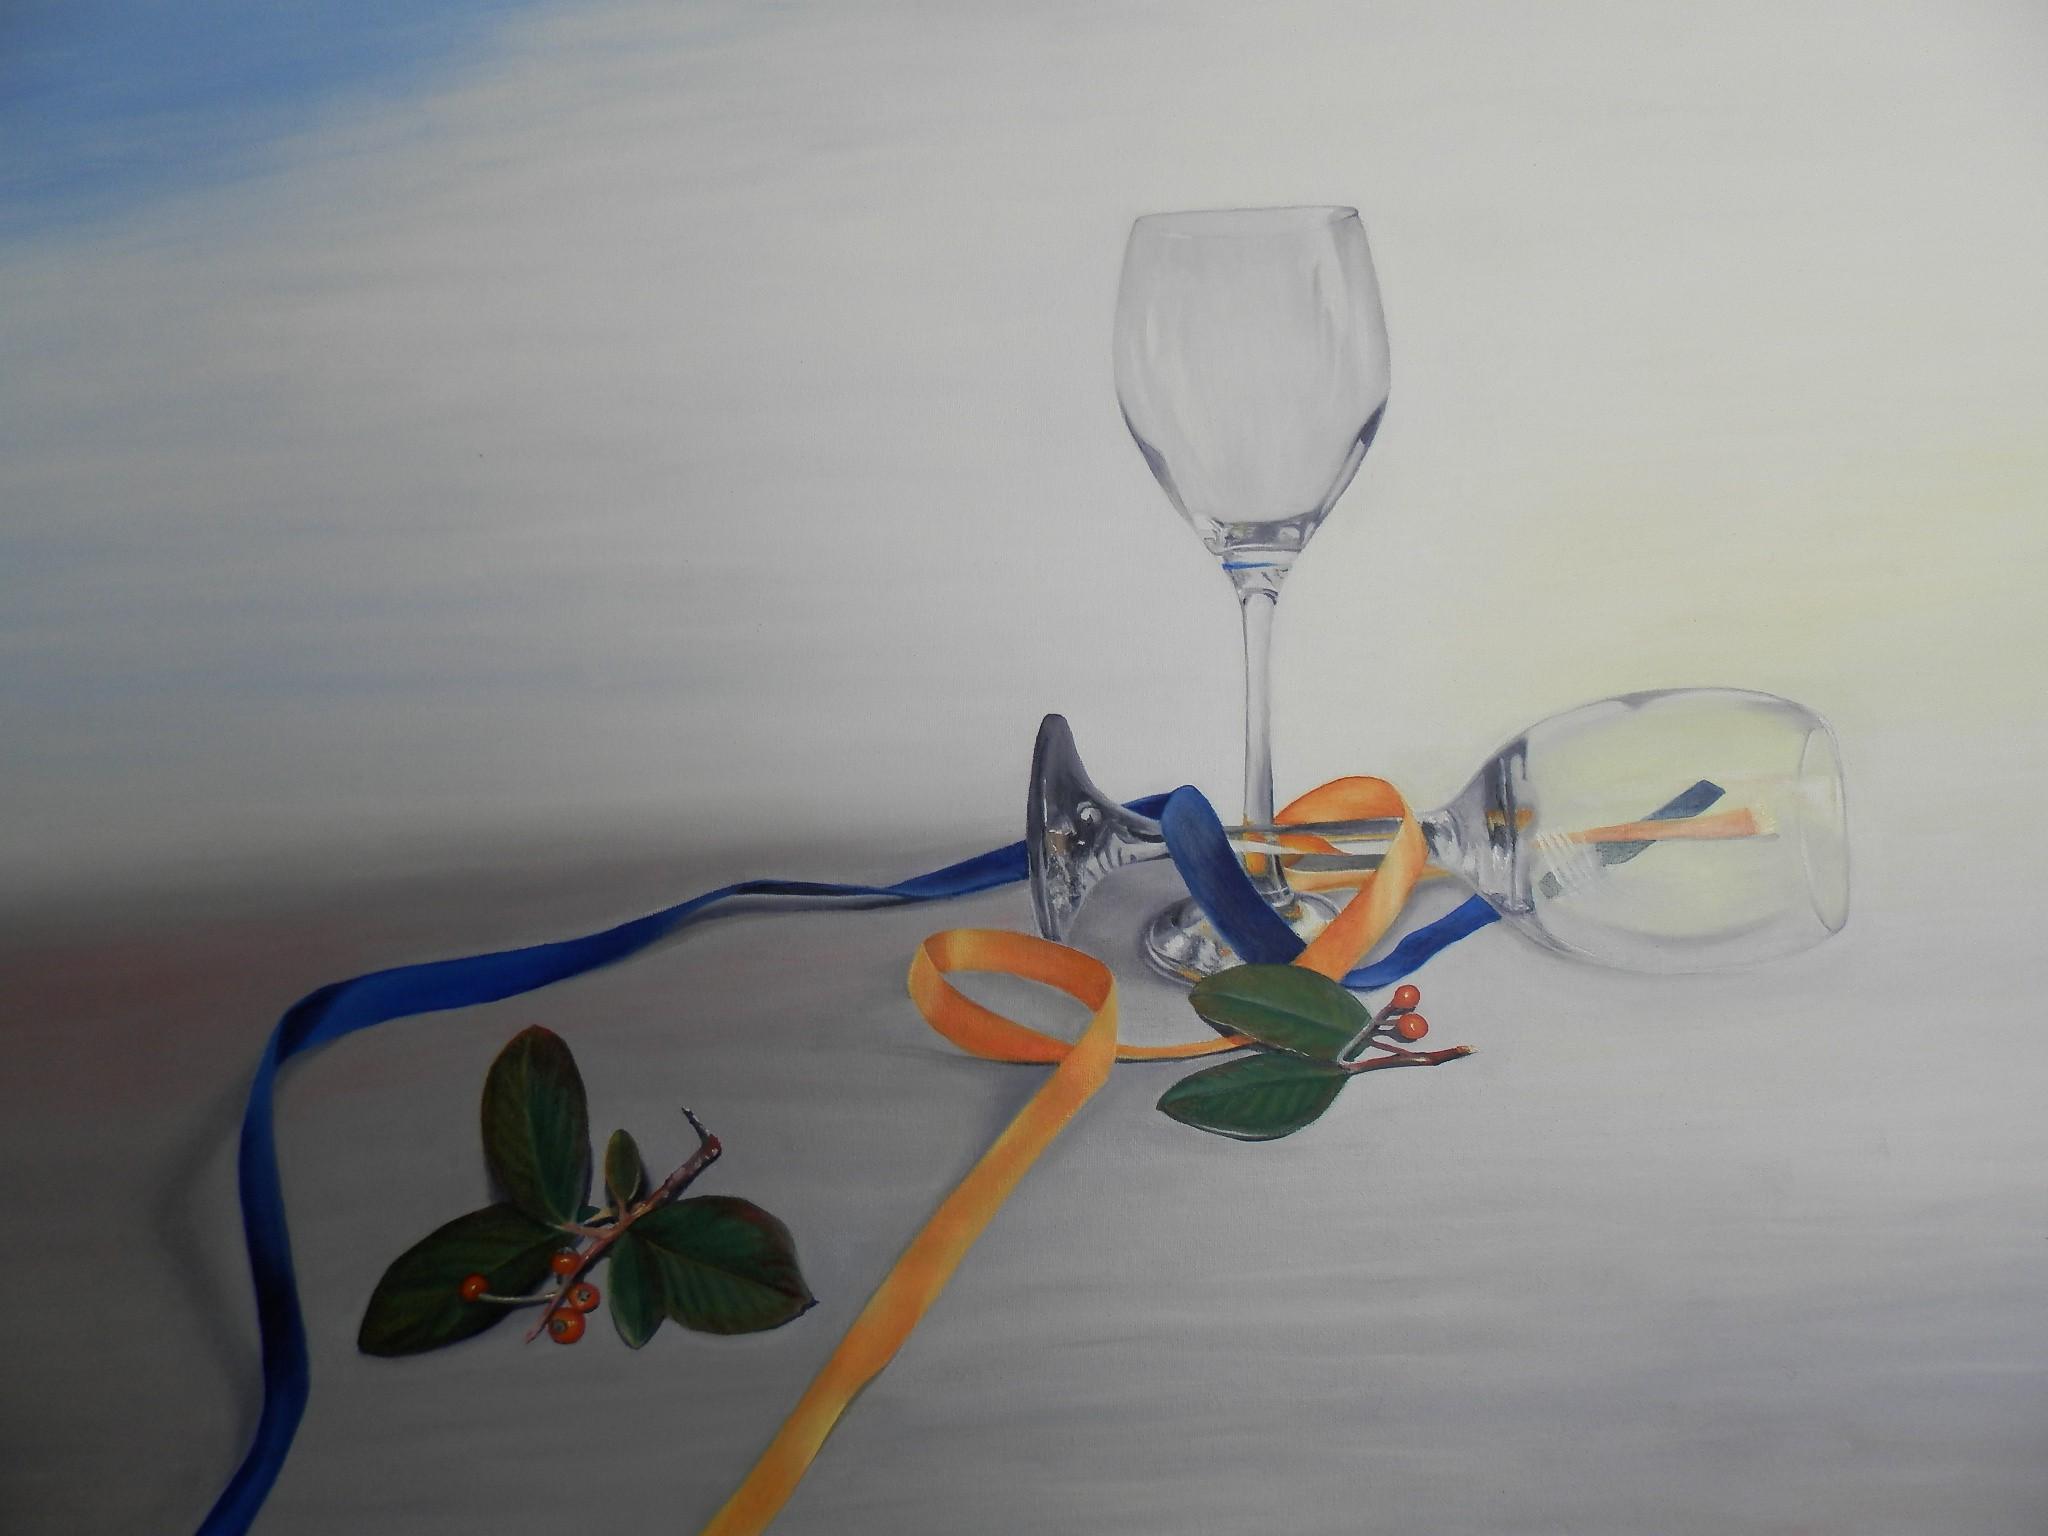 Crystal glasses